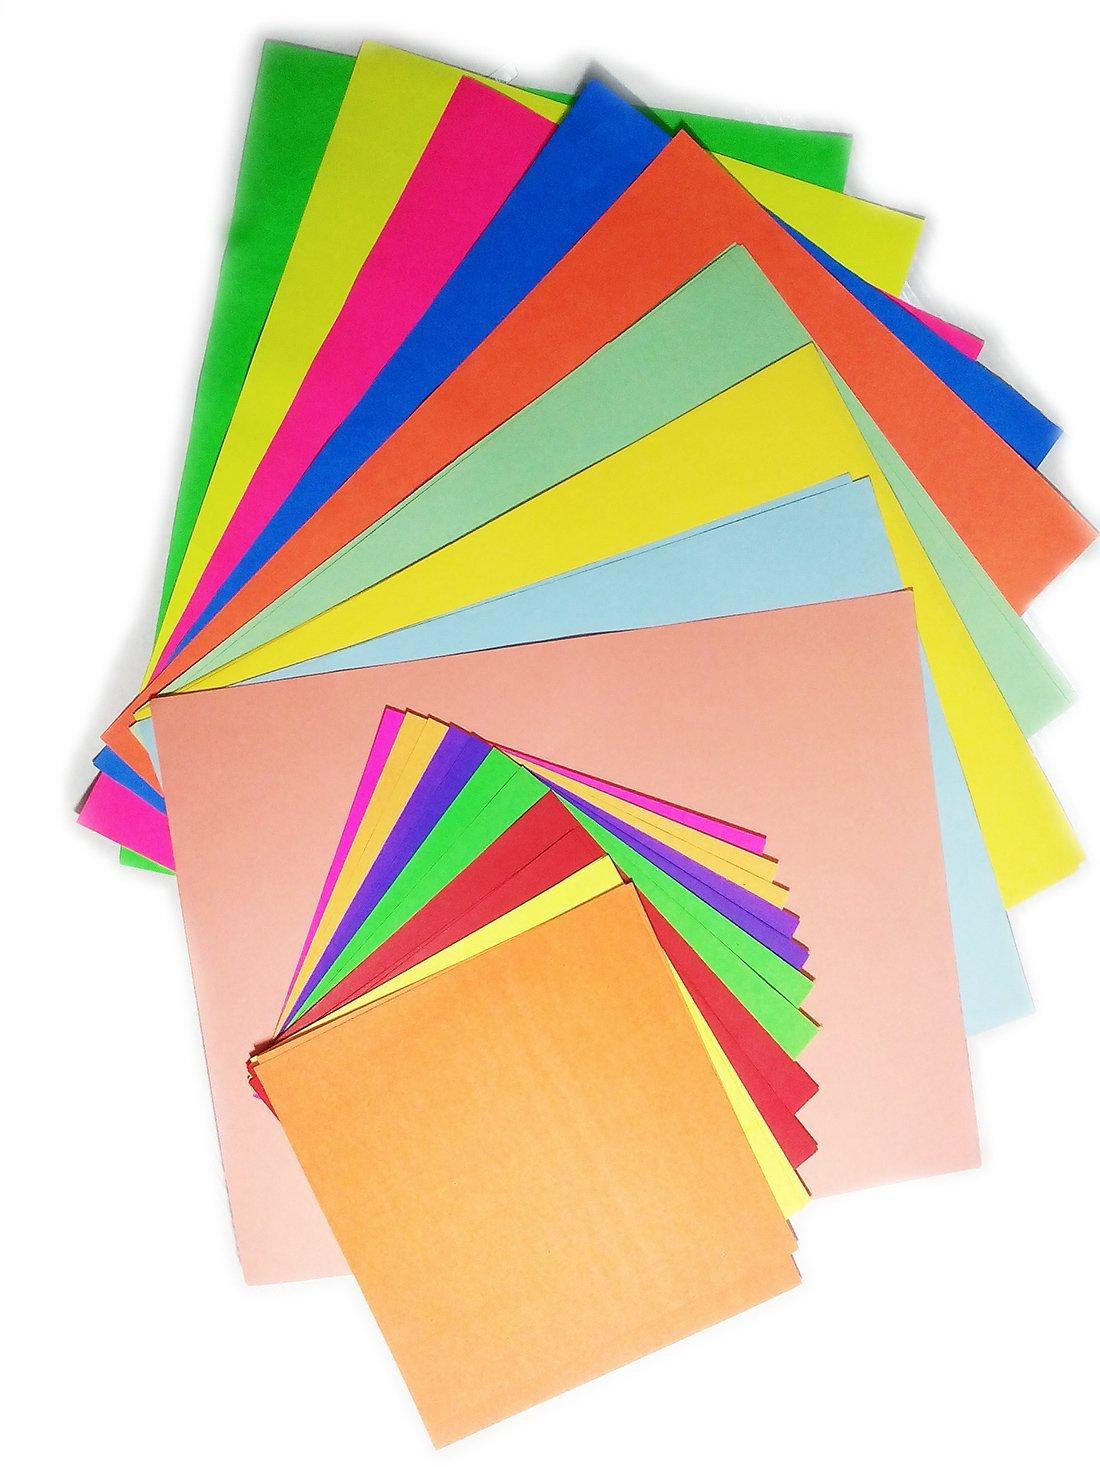 Origami Single Sheet Star Folding Instructions / Origami ... | 1467x1100